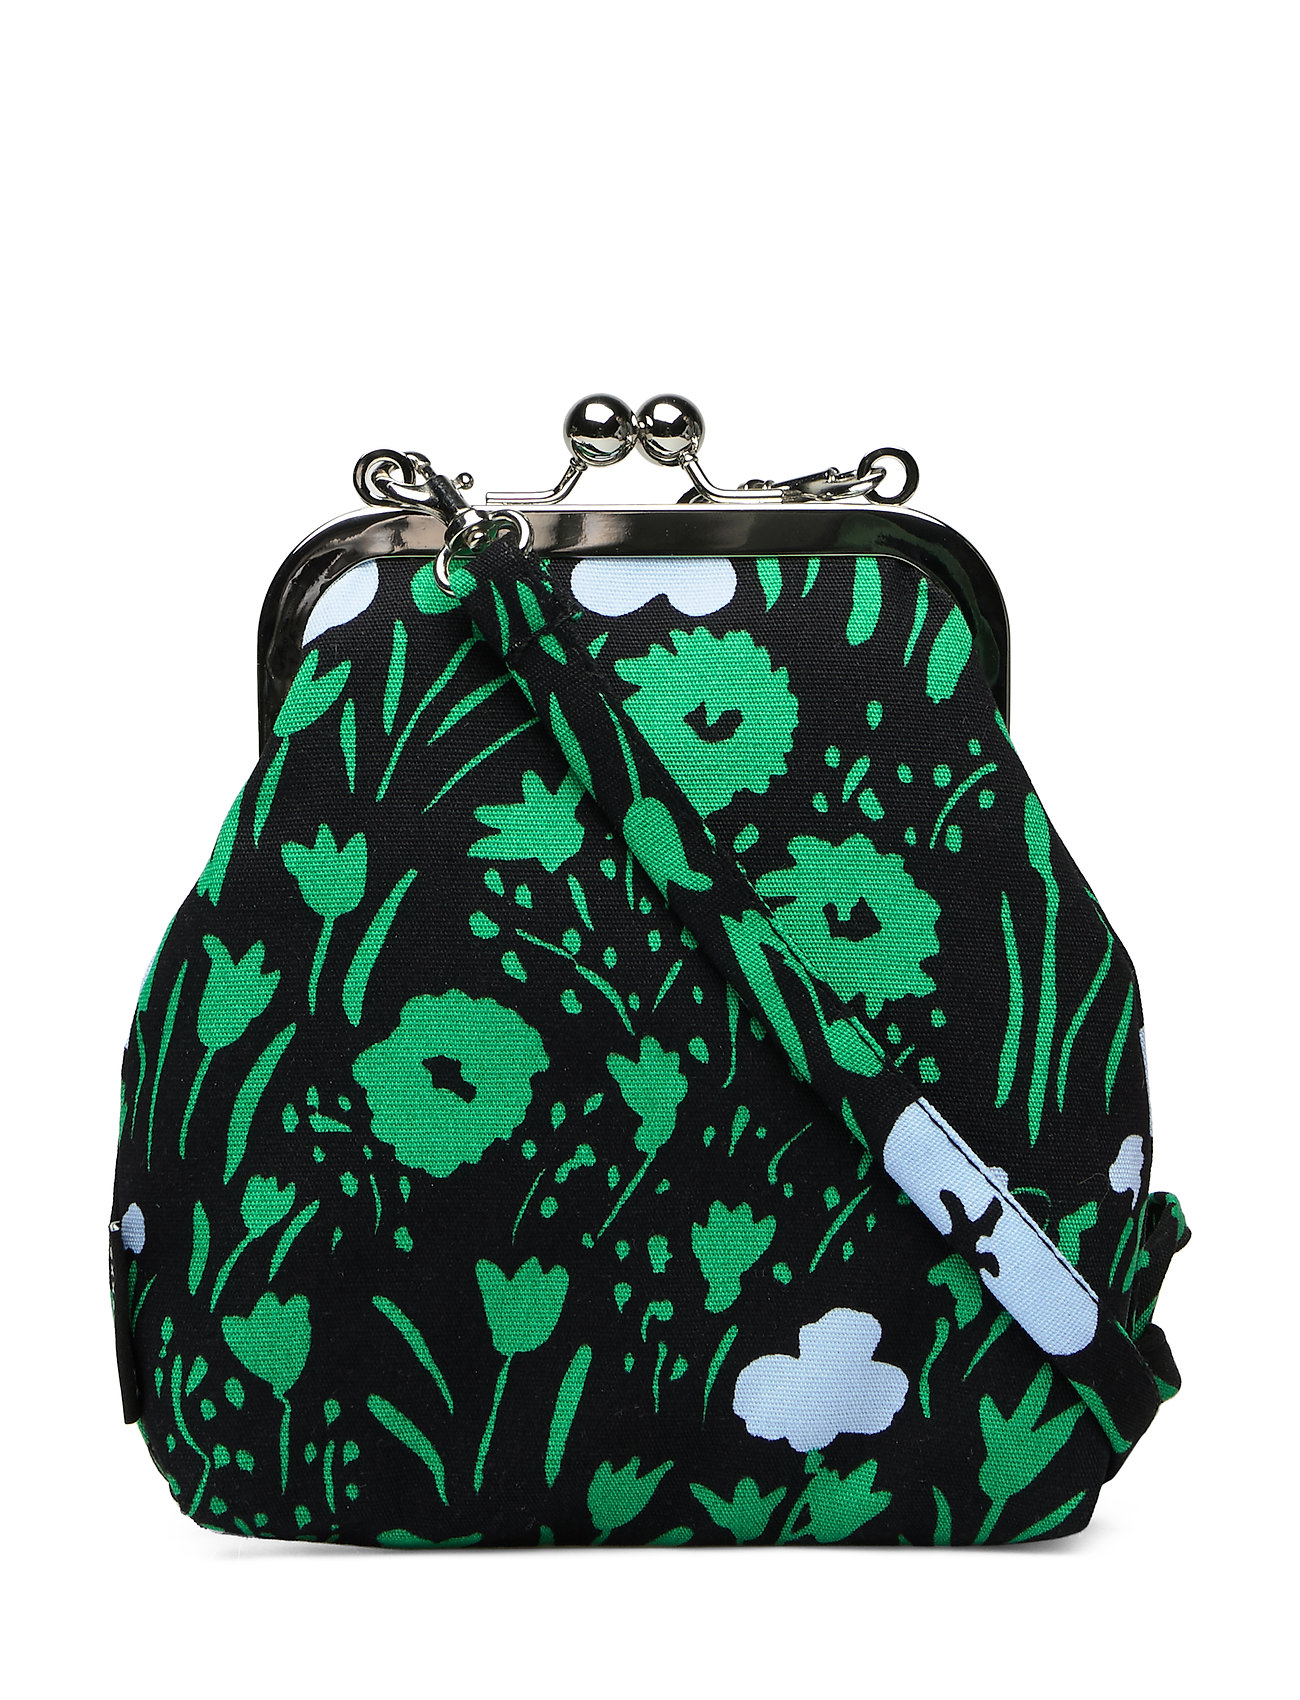 Marimekko ROOSA PIKKULEMPI Bag - BLACK,LIGHT BLUE,GREEN